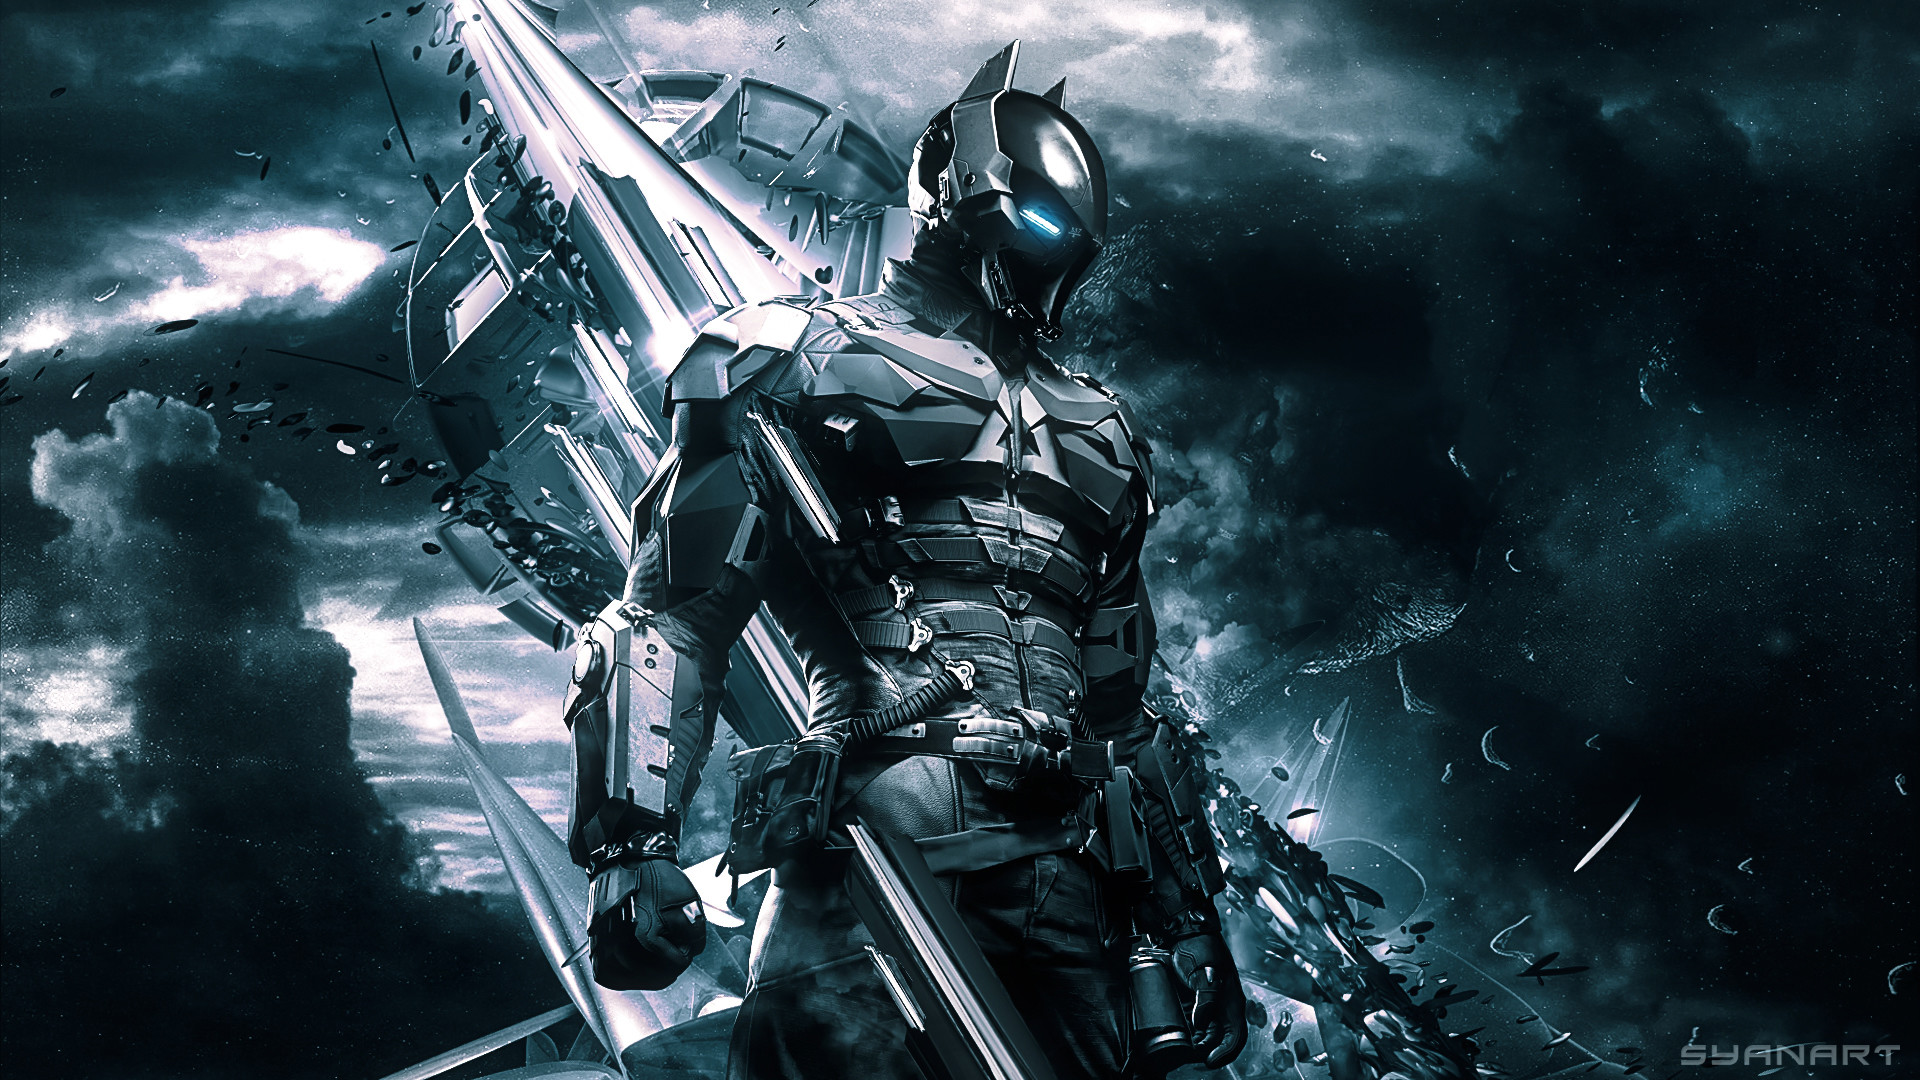 Post Views: 618. Categories: Batman Arkham Knight